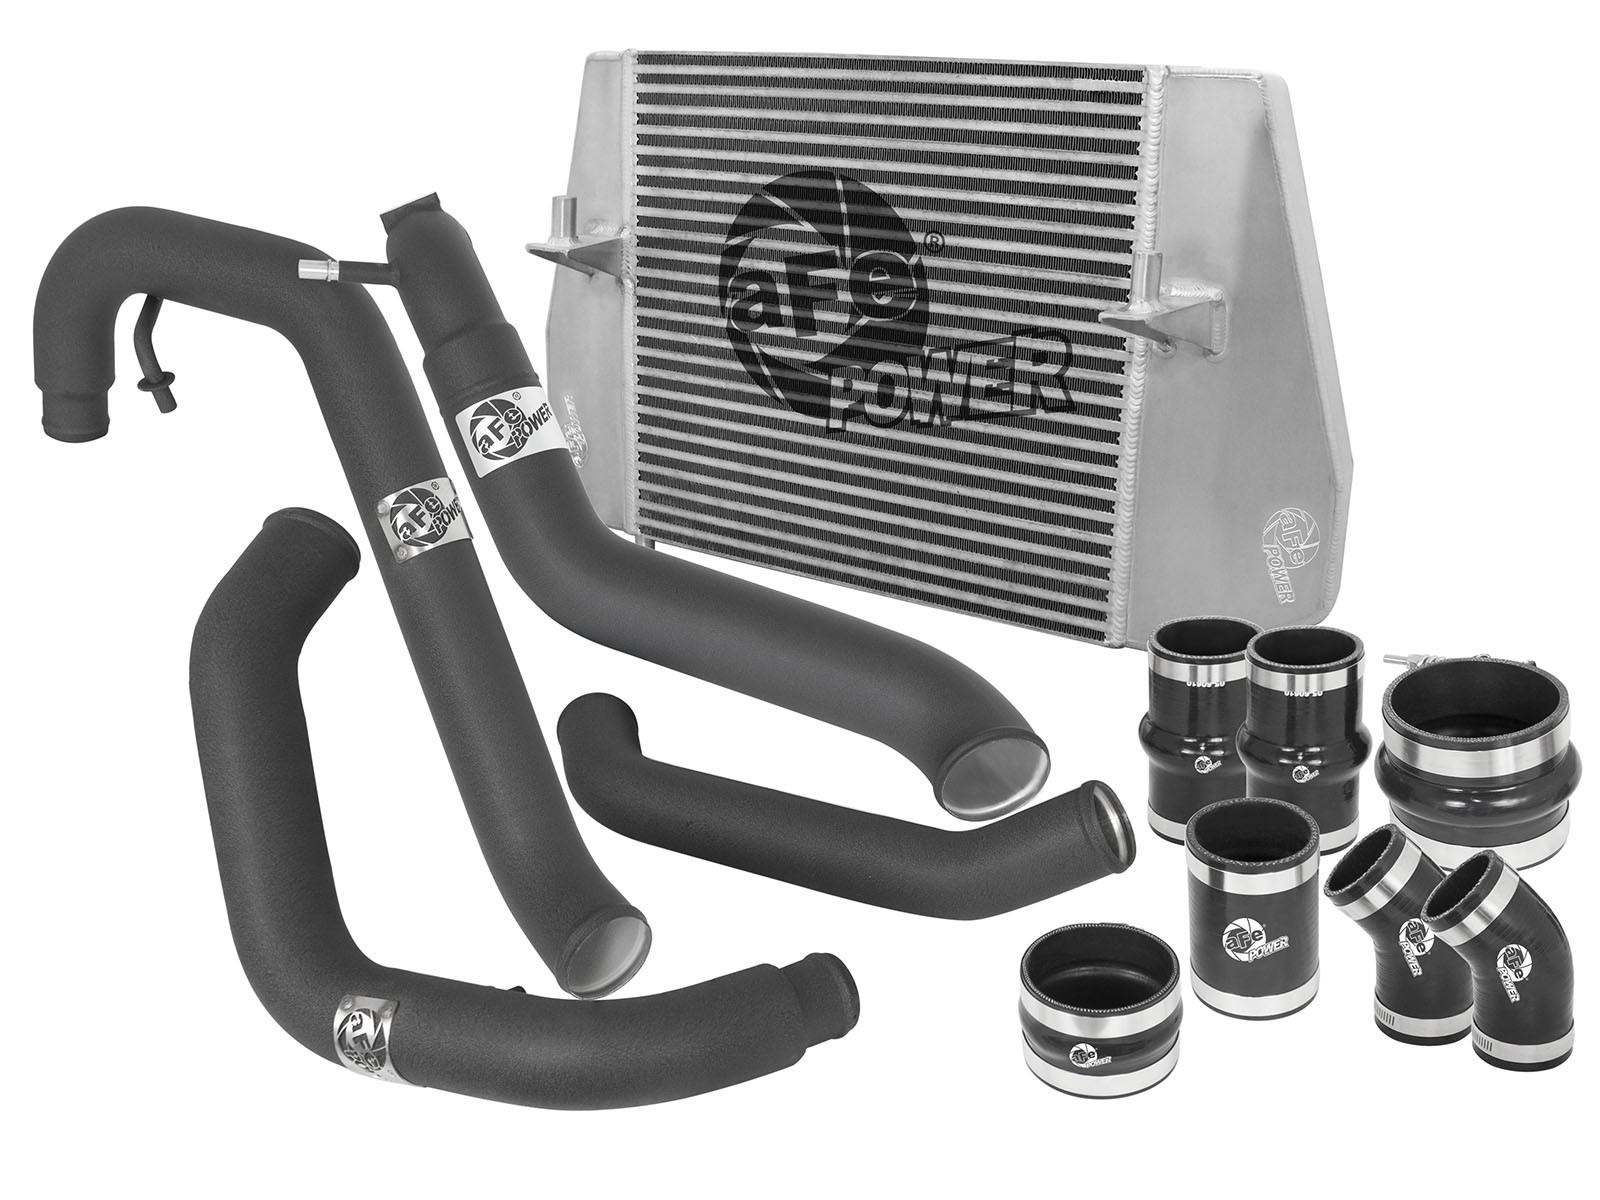 aFe POWER 46-20122-B BladeRunner GT Series Intercooler with Tubes